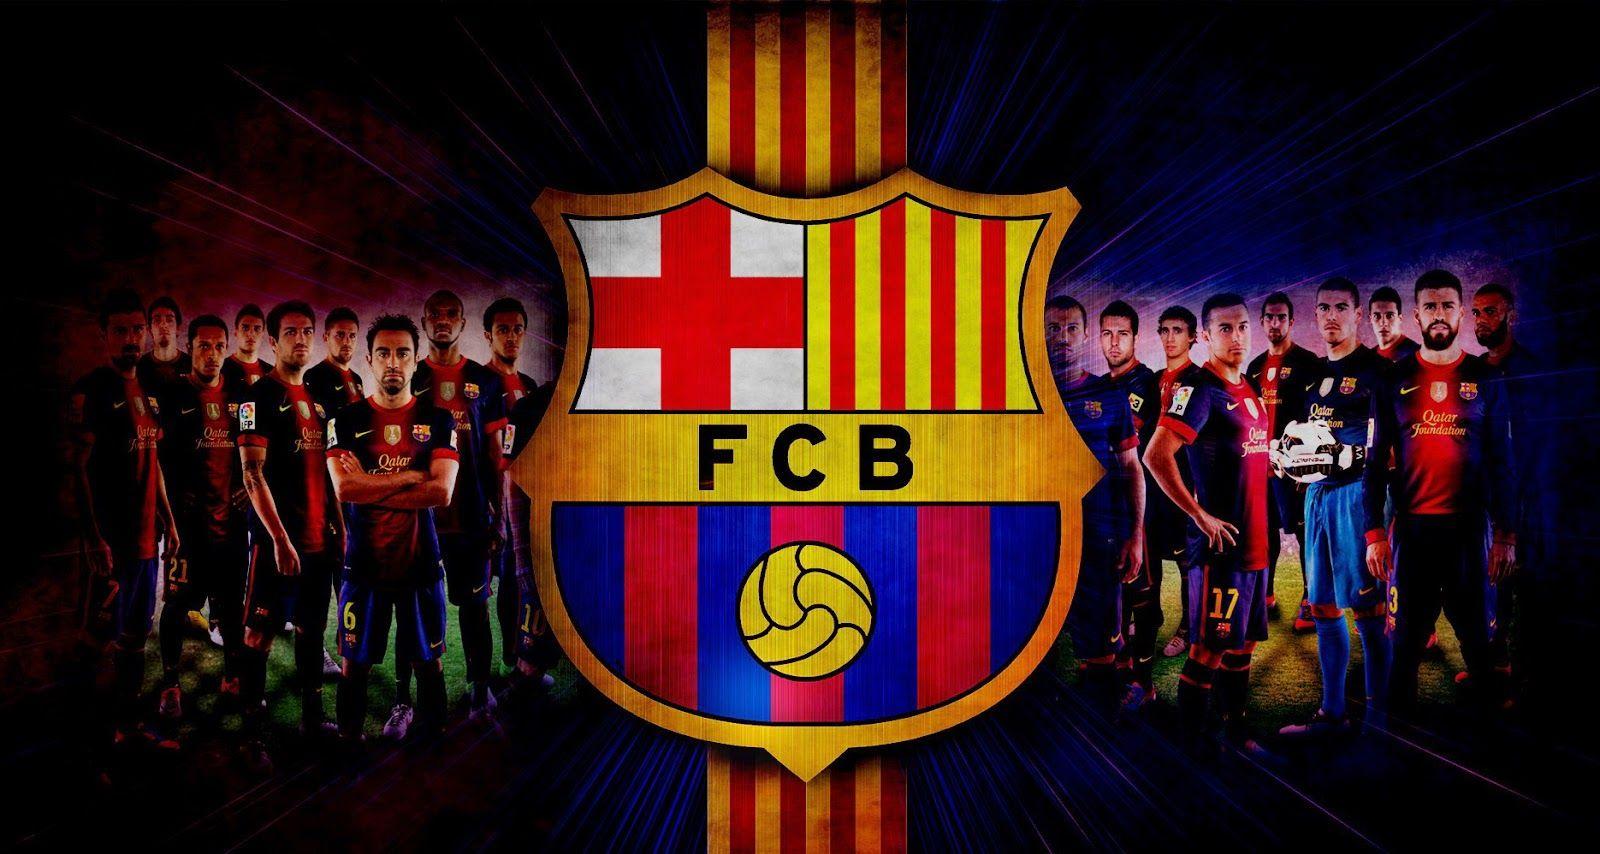 fc barcelona background